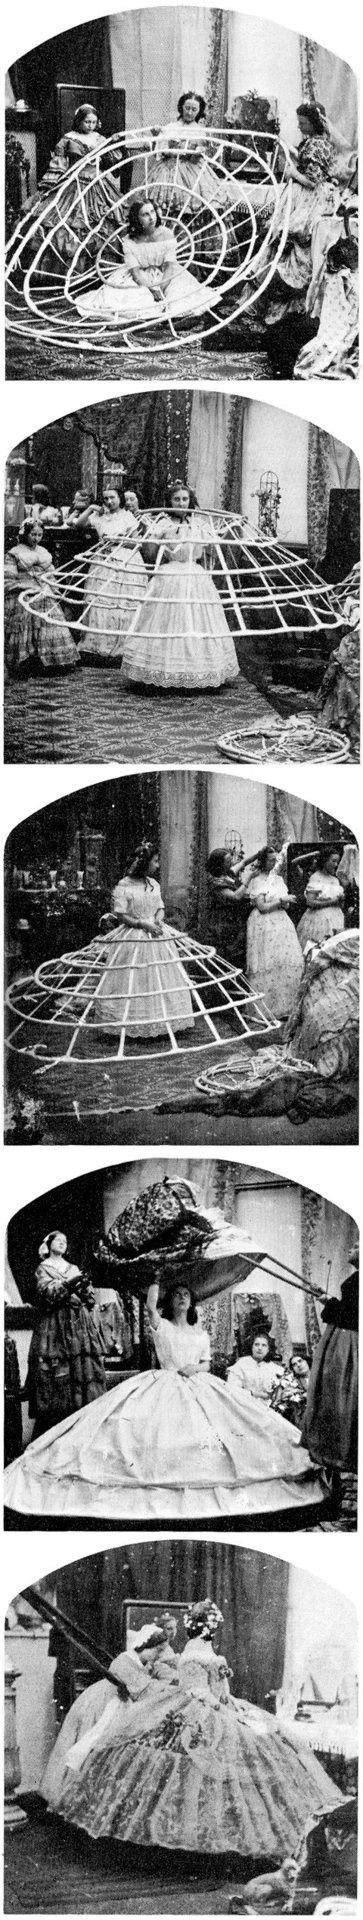 Putting on a crinoline, 1850-1860